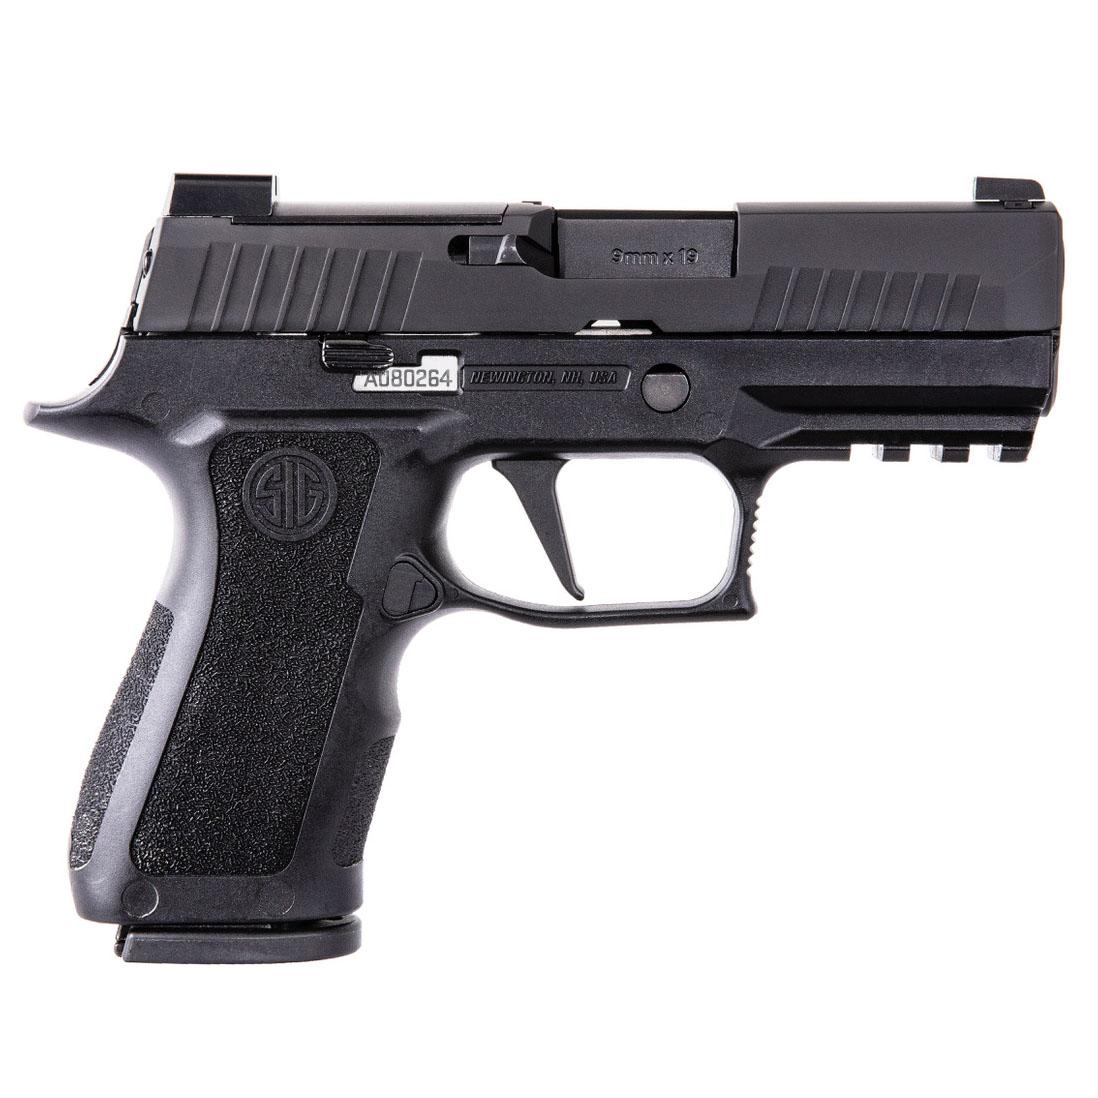 p320 x compact